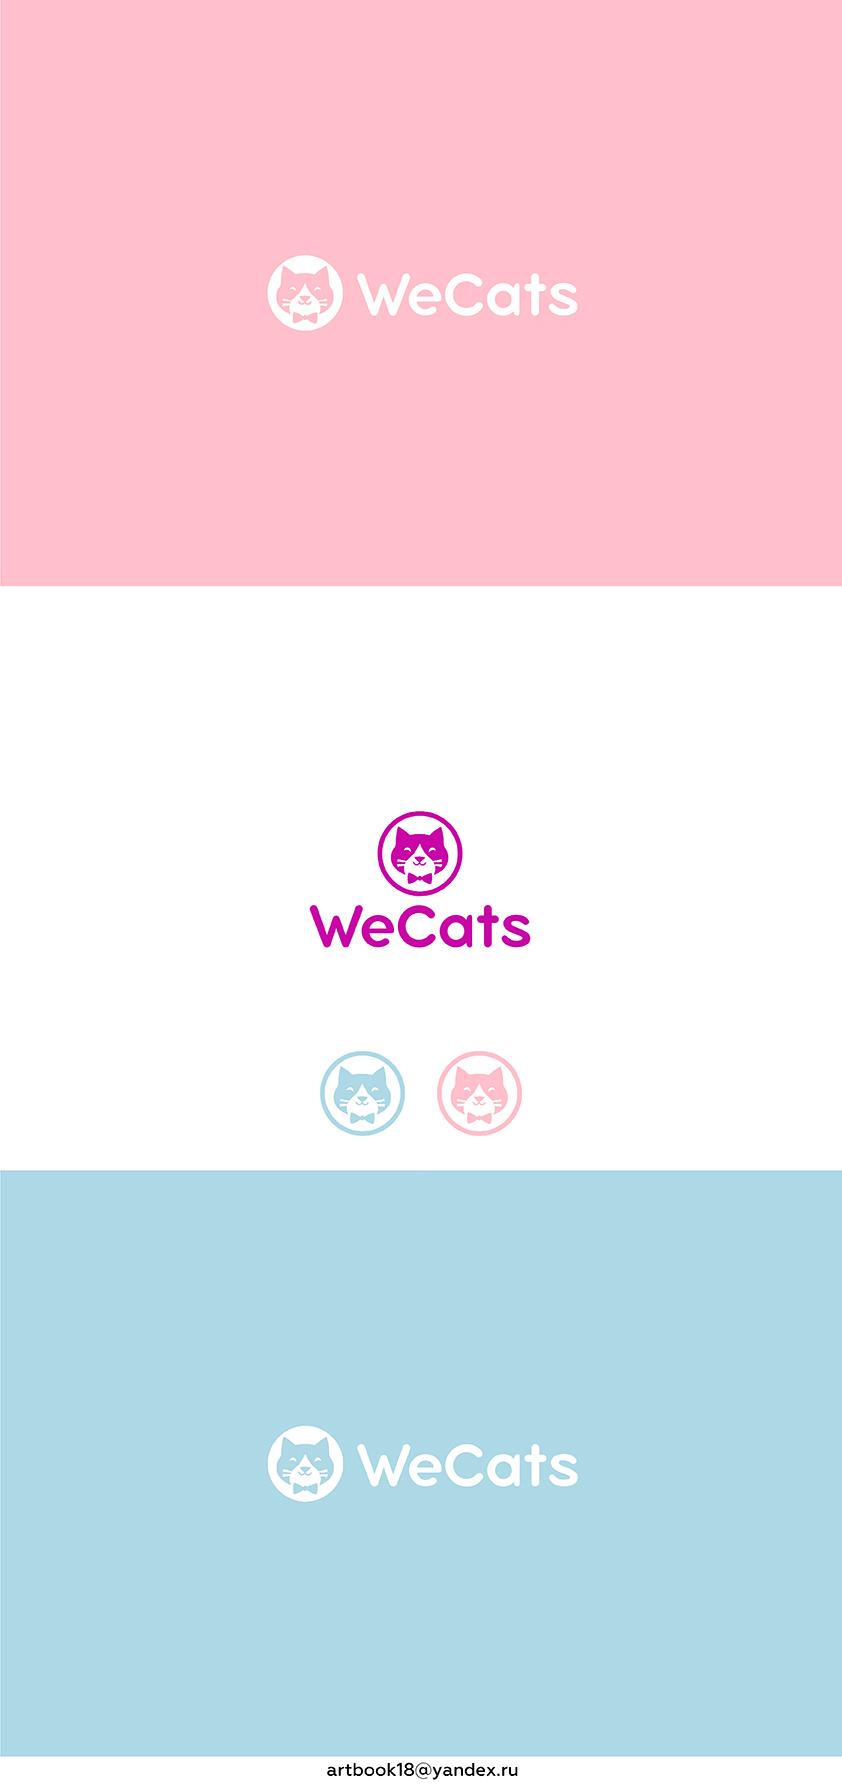 Создание логотипа WeCats фото f_2935f1da817a43d9.jpg